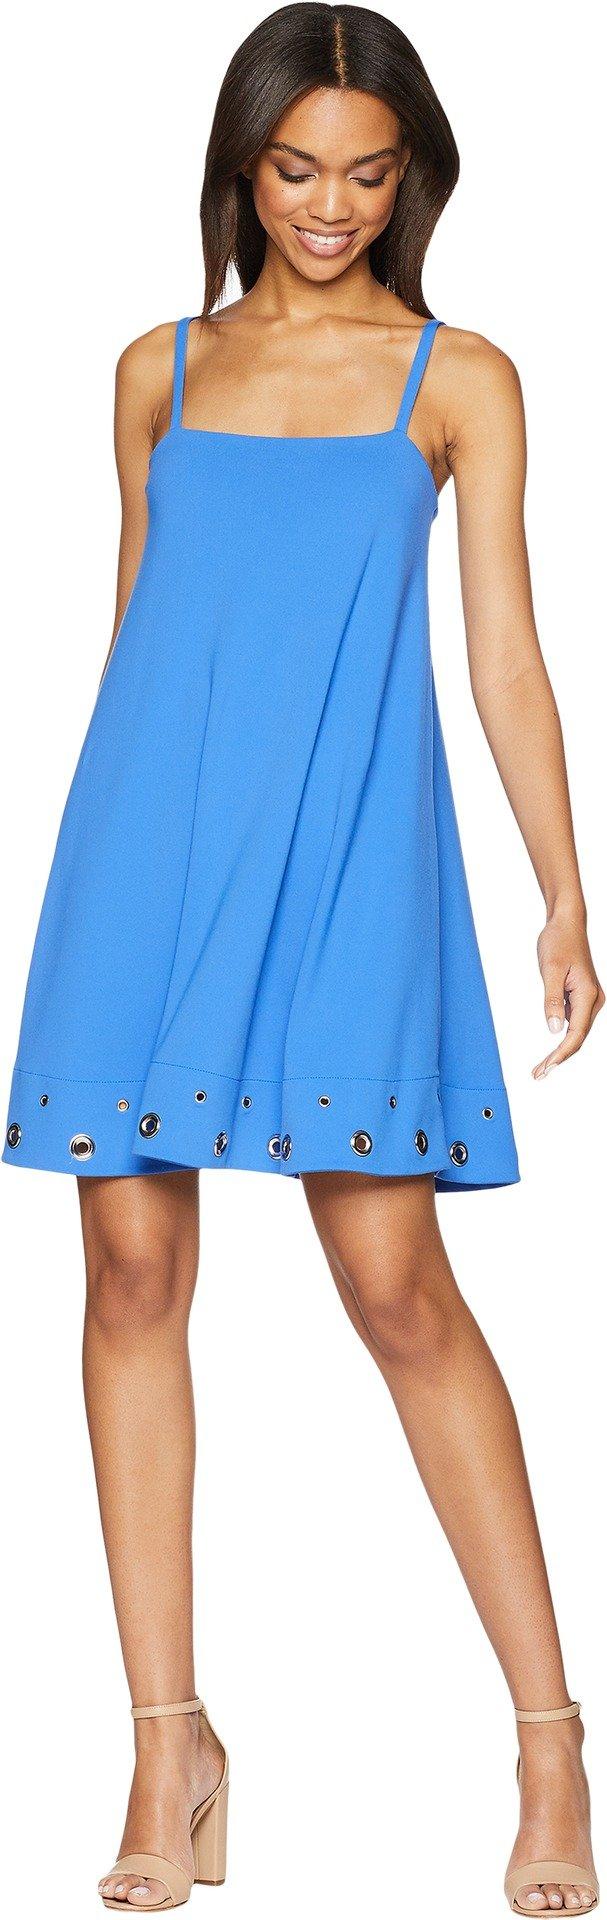 Available at Amazon: Susana Monaco Women's Grommet Hem Detail Dress